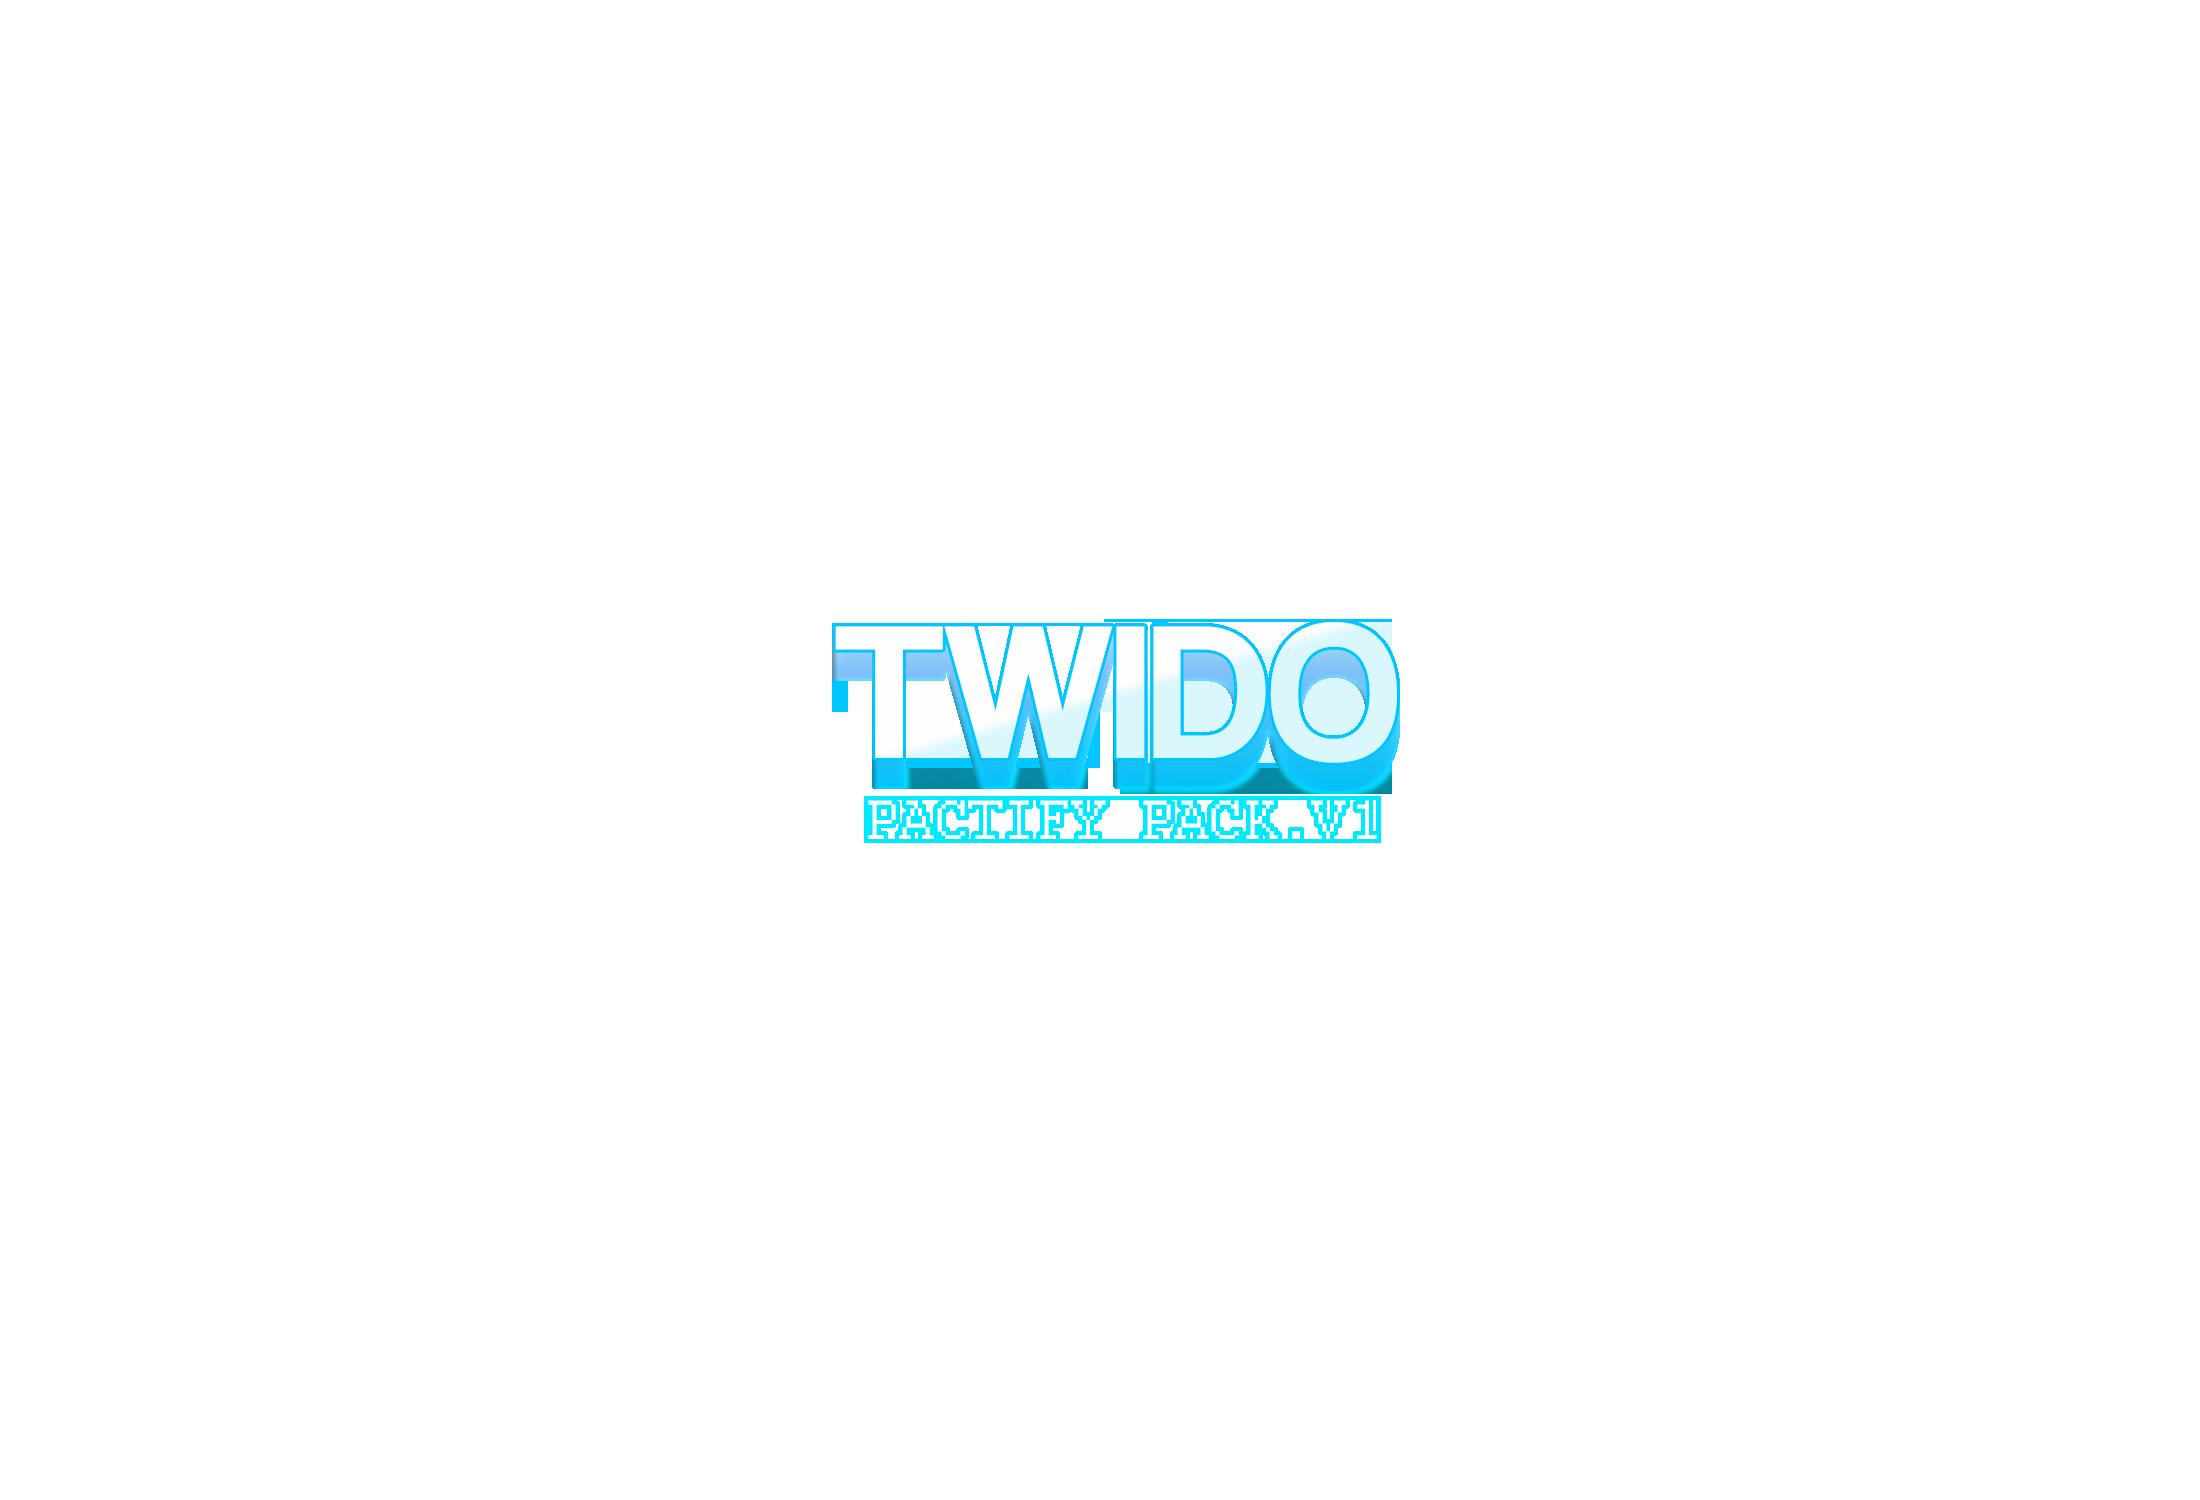 www.toneden.io